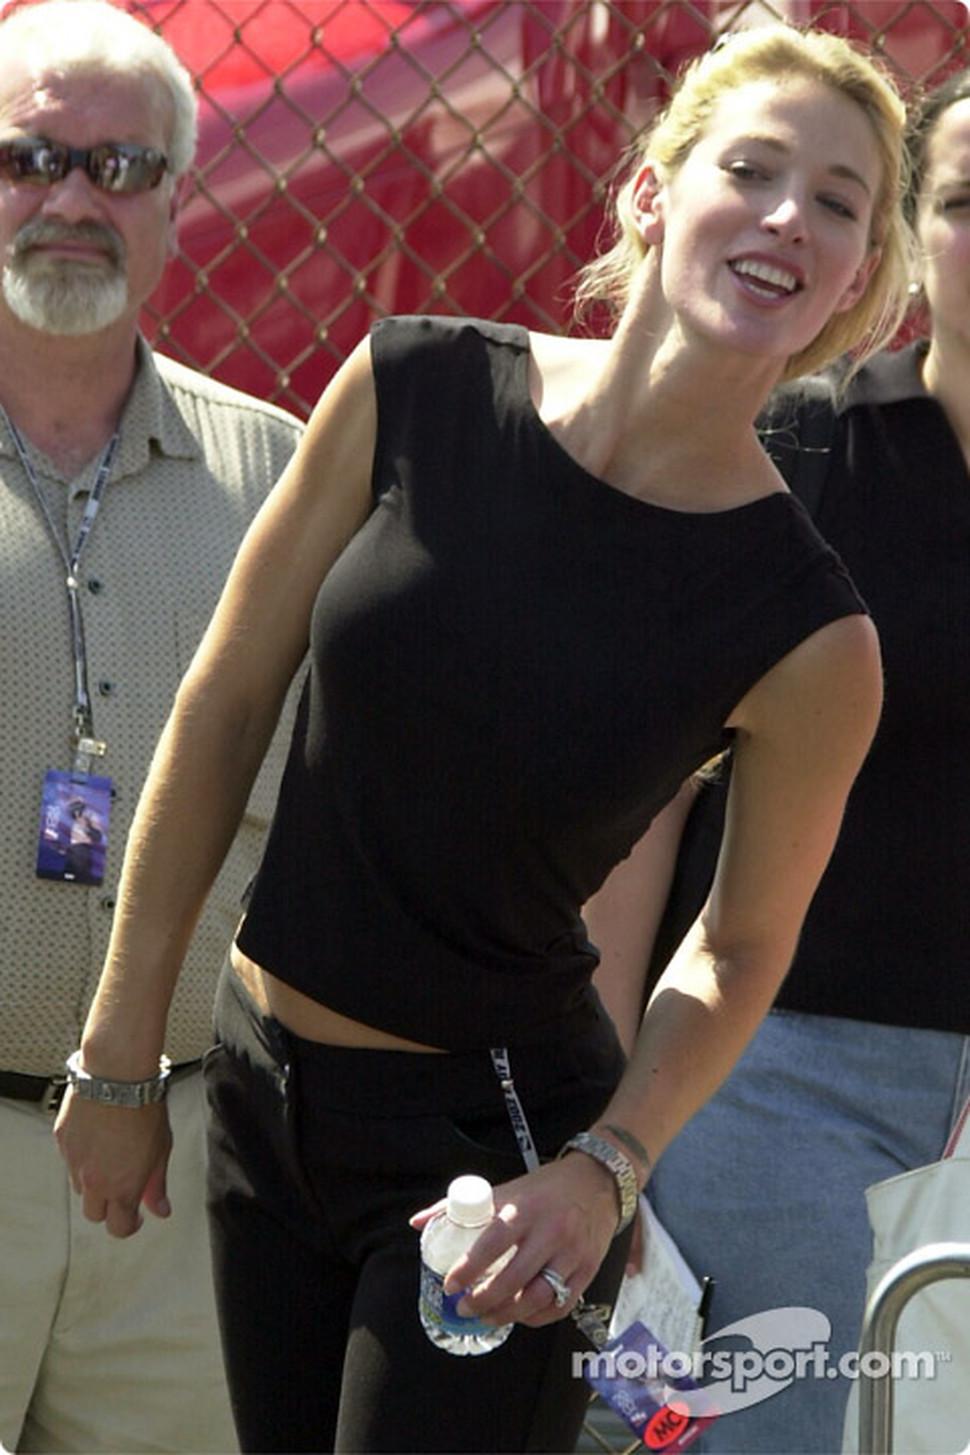 Elaine Irwin And Jay Penske Baby Image   LONG HAIRSTYLES